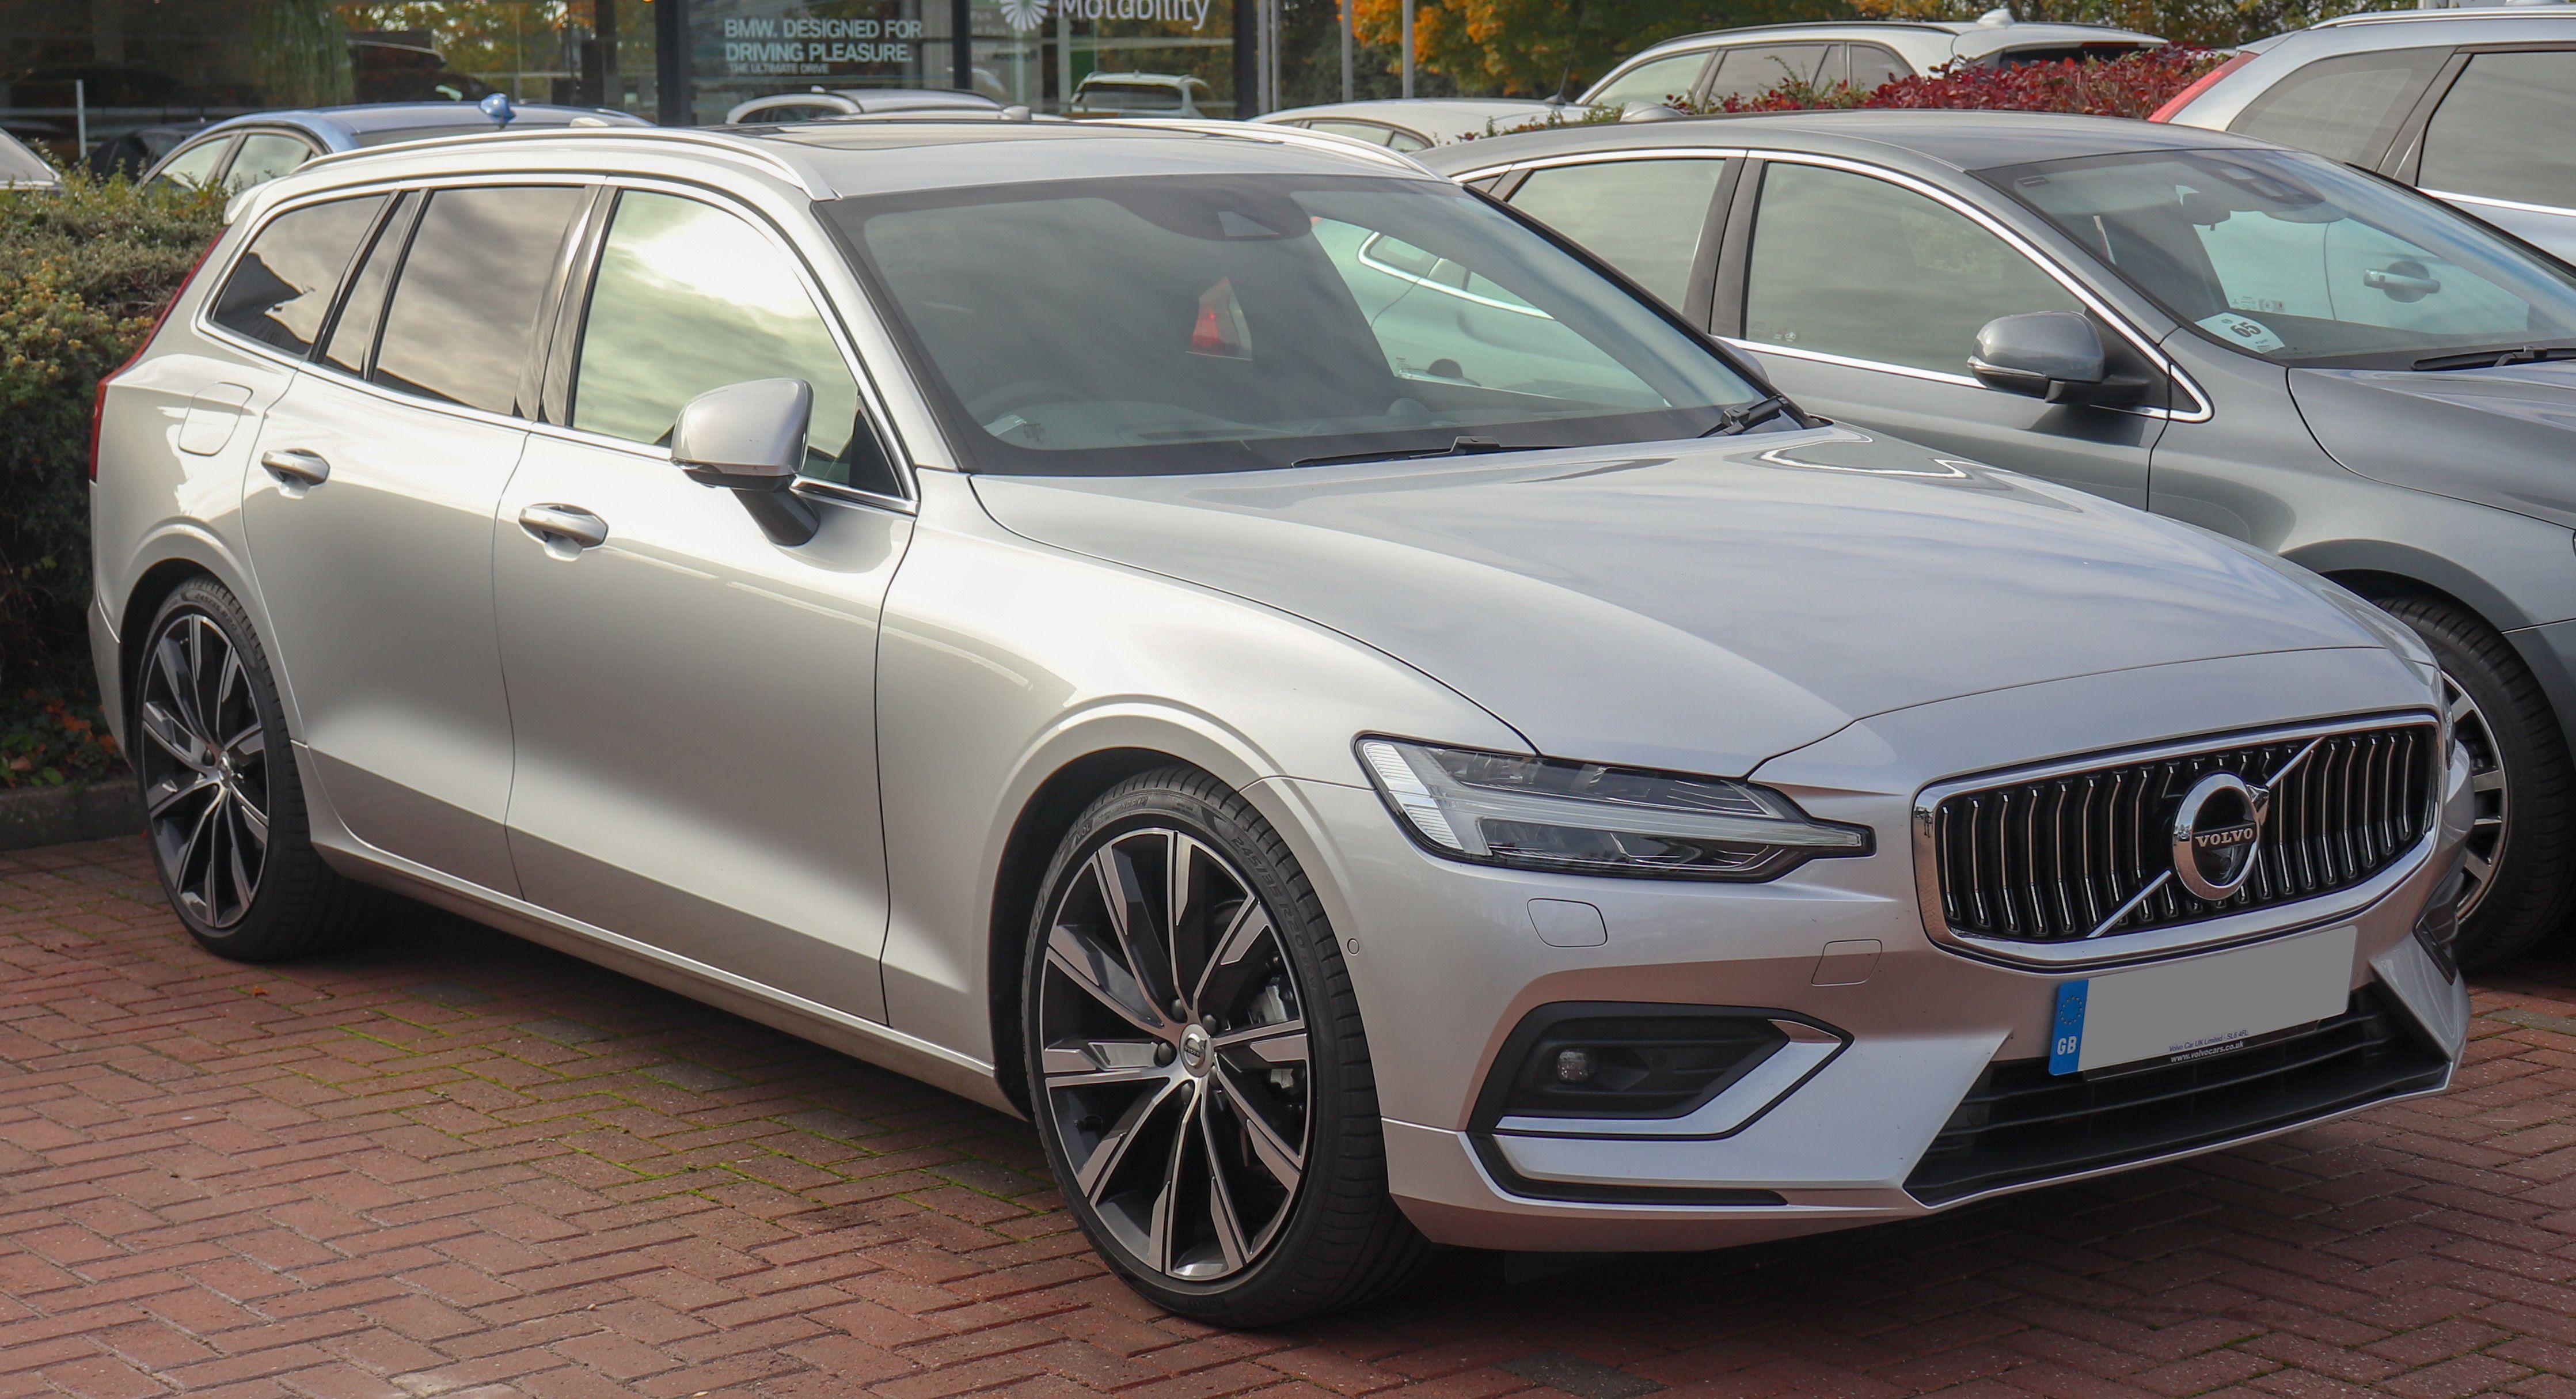 2020 Volvo Xc70 New Generation Wagon Exterior and Interior